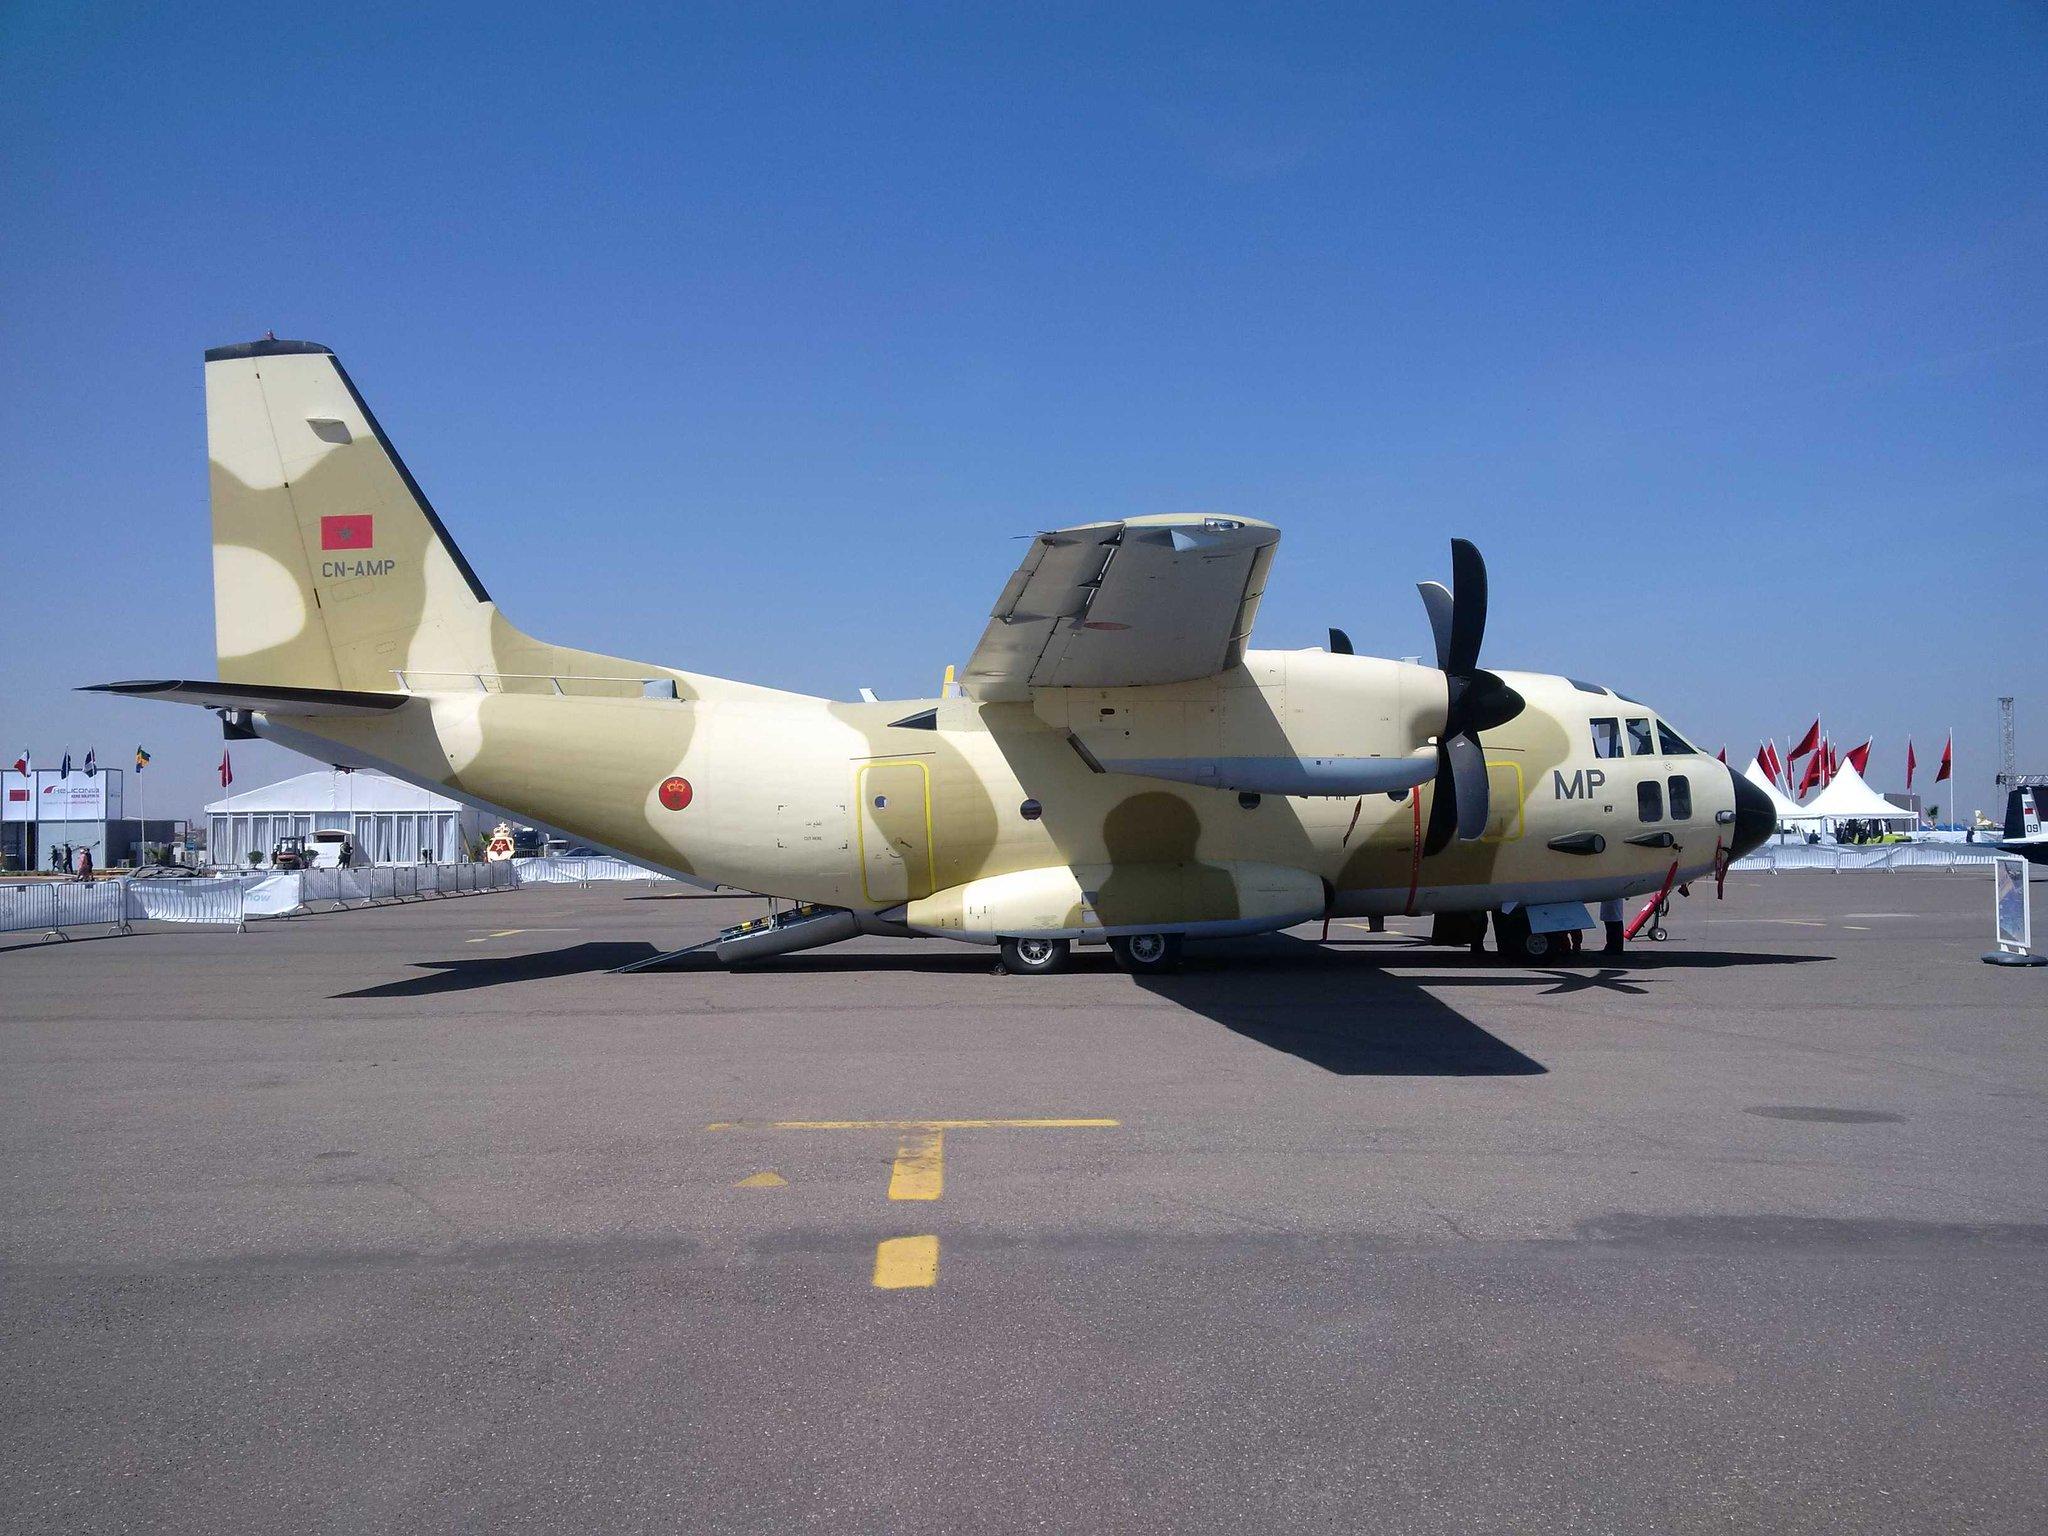 FRA: Photos d'avions de transport - Page 27 Cg9hfeMWUAAJPgb